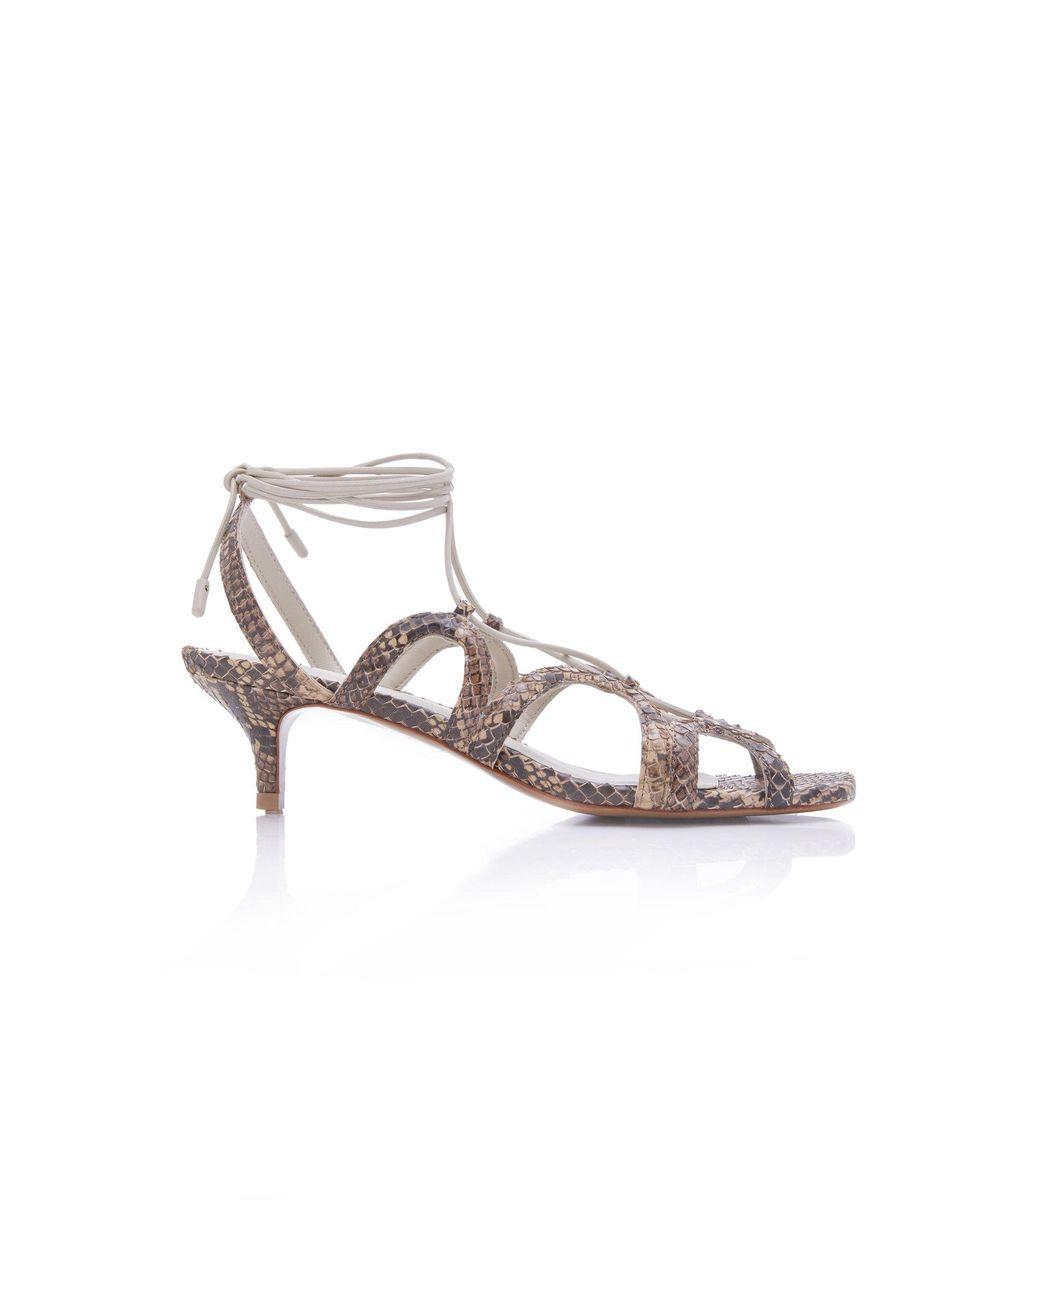 3f4c38366fd Zimmermann. Women s Scallop Kitten Heel Sandals